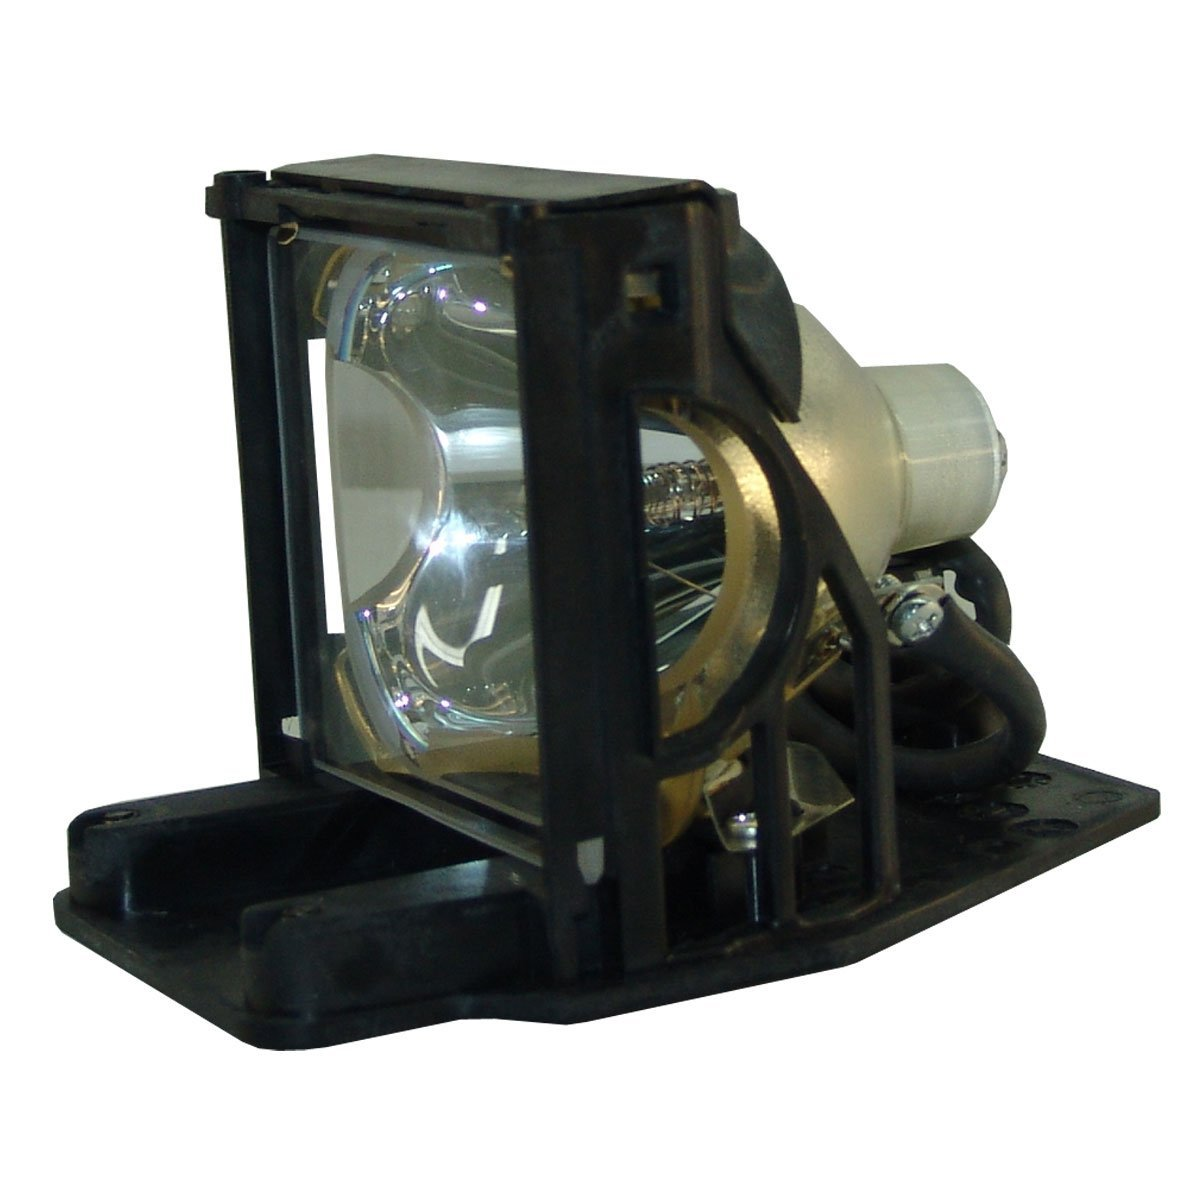 SP-LAMP-012 SPLAMP012 for InFocus LP815 LP820 / Proxima DP8200 DP8200X /Triumph M-800 /Ask Proxima C410 C420 Projector Lamp Bulb проектор ask proxima us1275